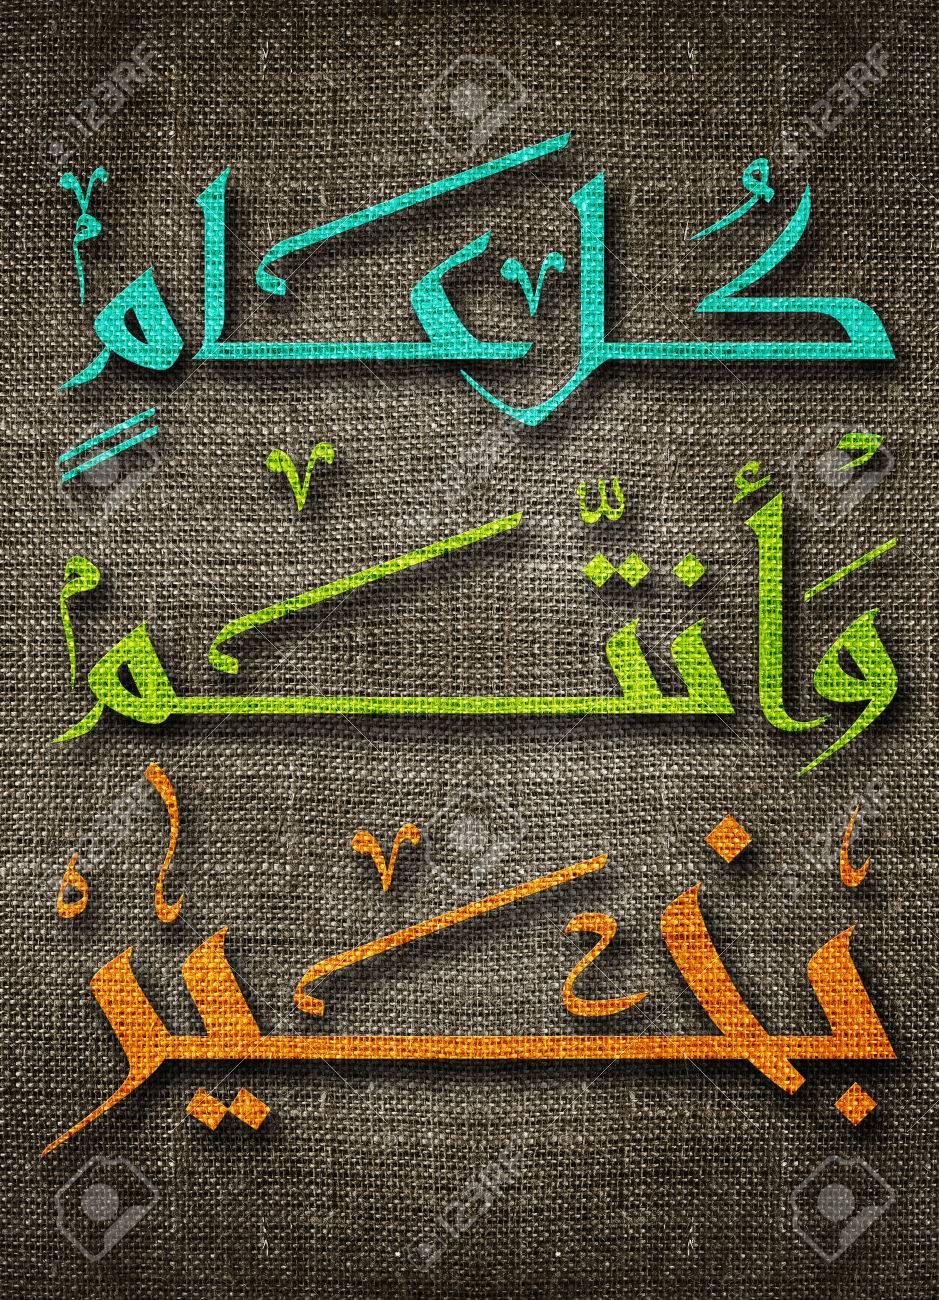 Great Ramadan Eid Al-Fitr Greeting - 39373225-the-holy-month-of-muslim-community-festival-ramadan-kareem-and-eid-al-fitr-greeting-card-with-arabic  Collection_821124 .jpg